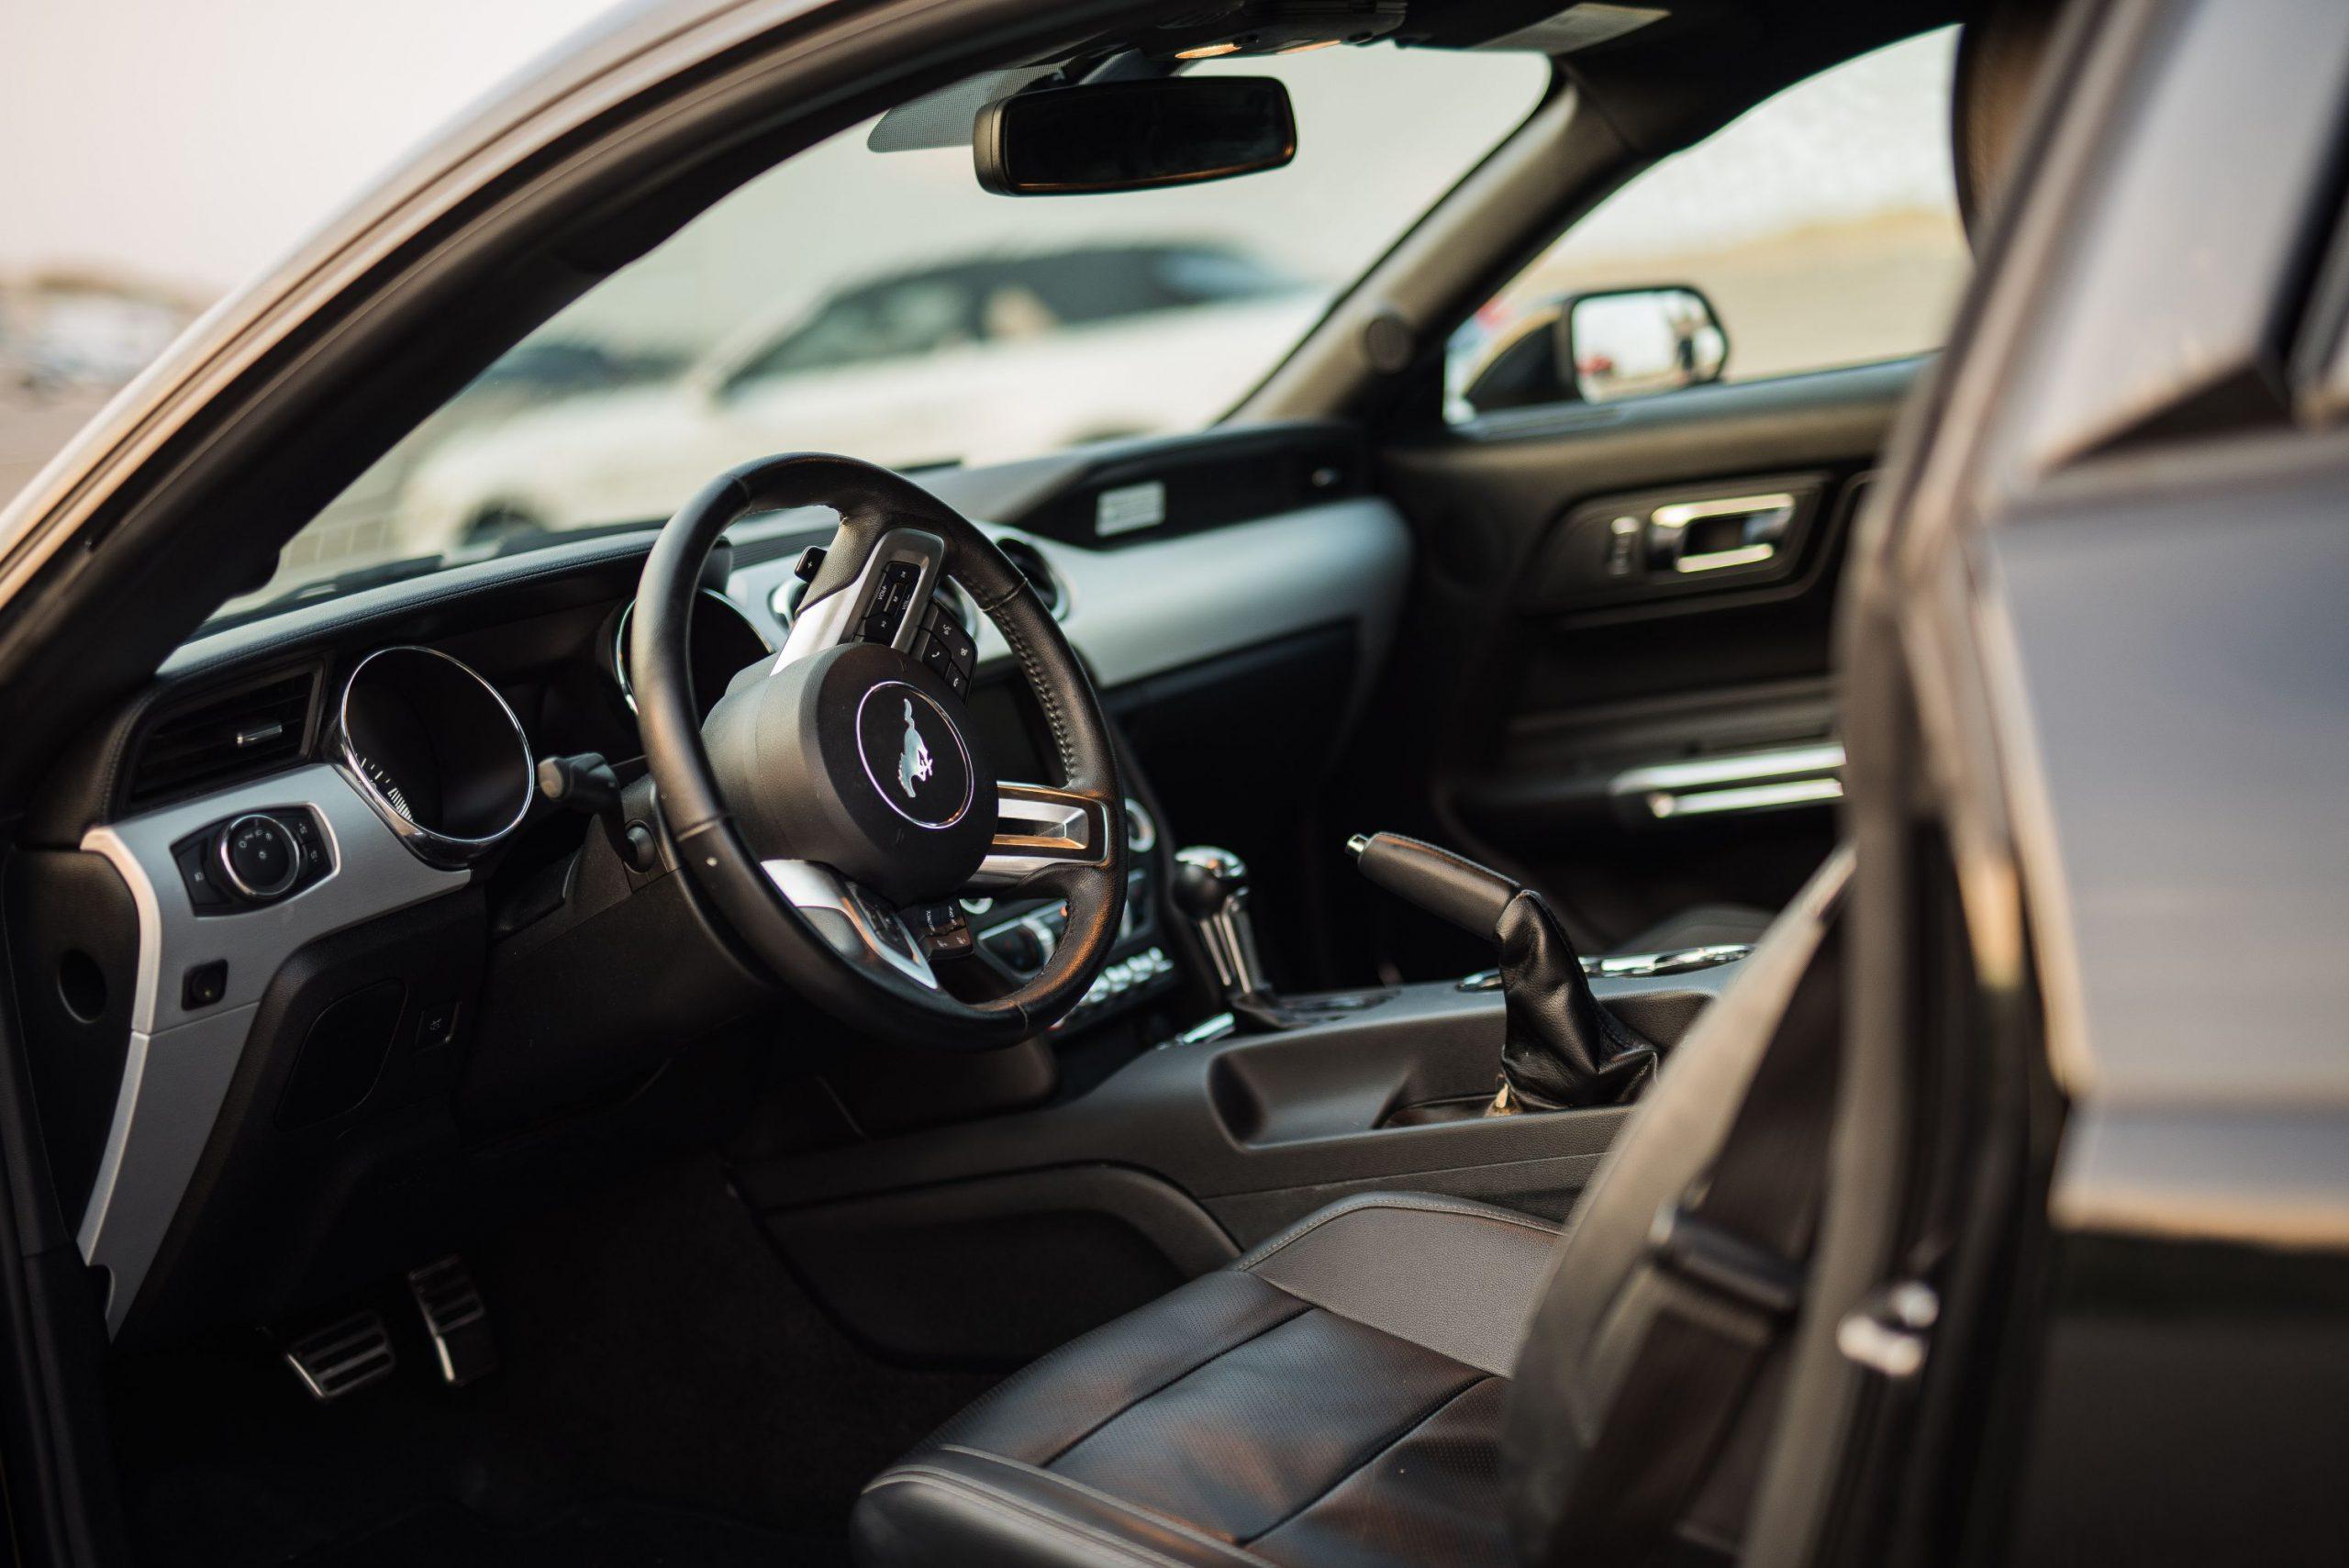 Ford Mustang GT trouwauto huren 7